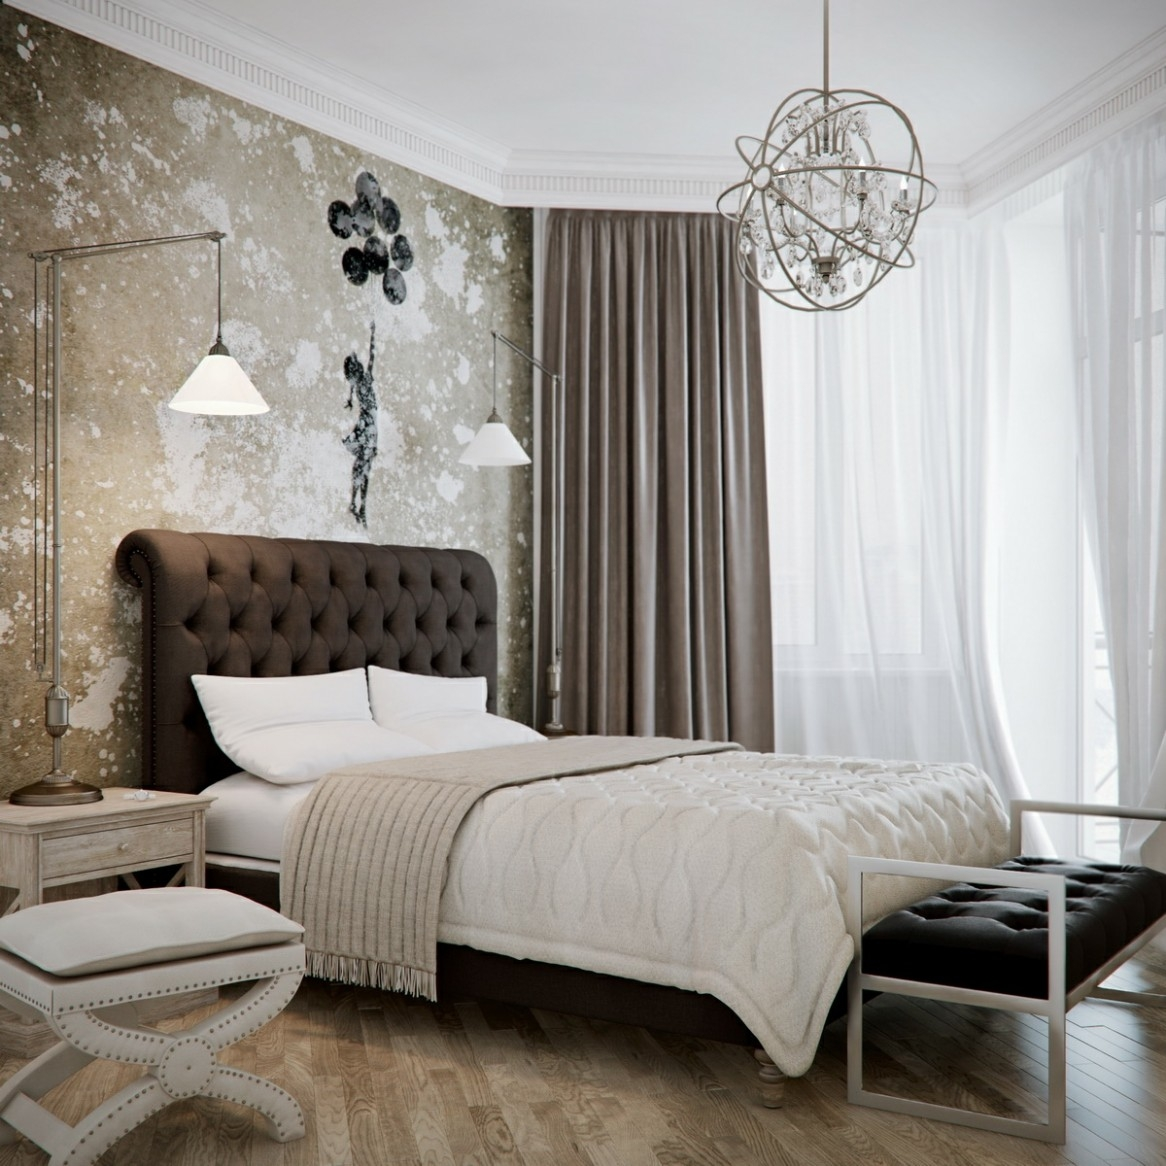 Black Chandelier For Bedroom Shanti Designs Within Black Chandelier Bedroom (#7 of 12)